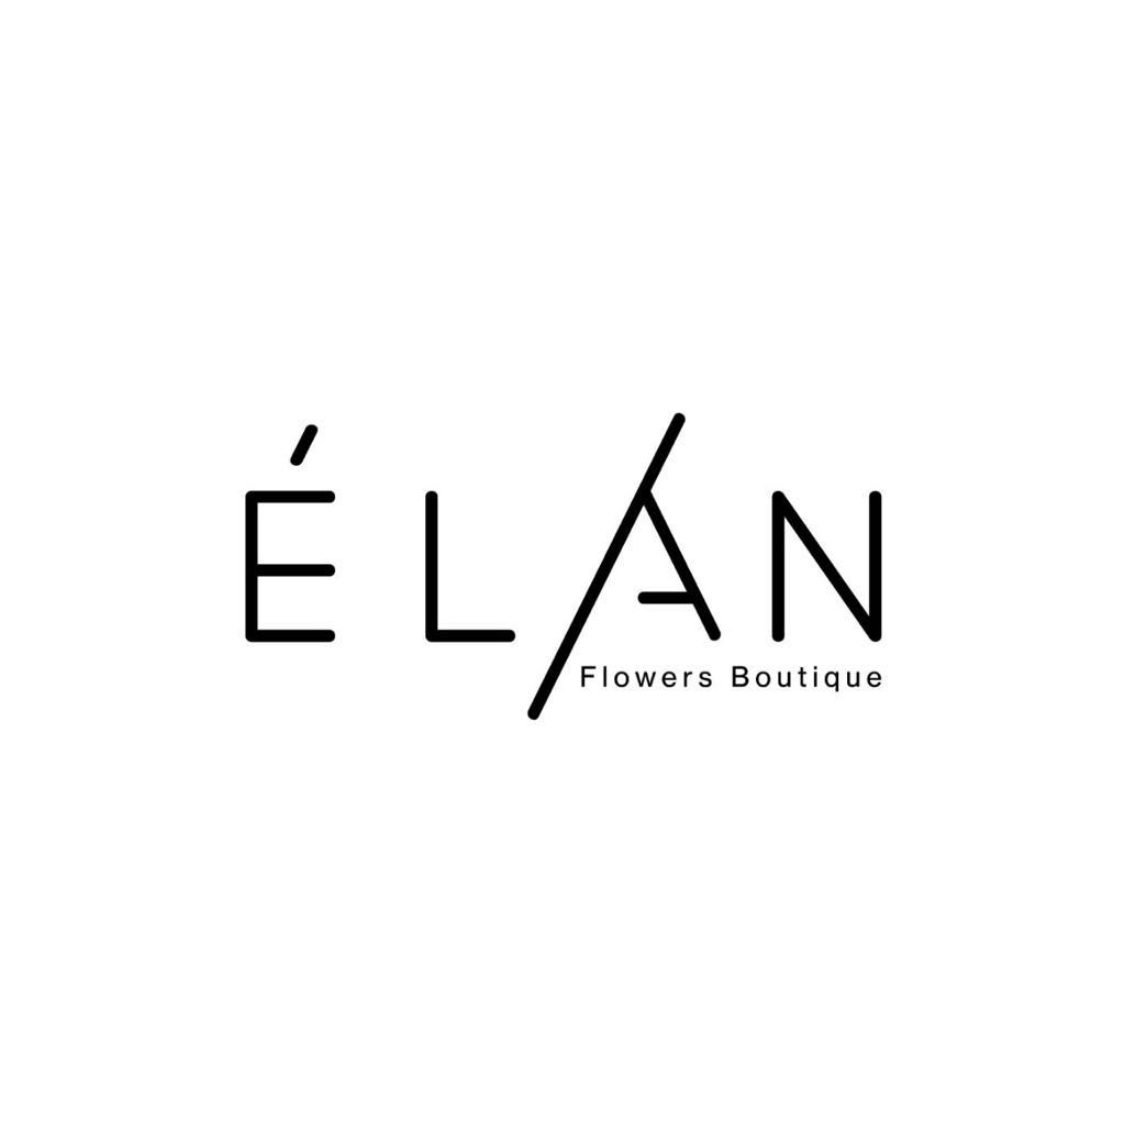 Elan Flowers